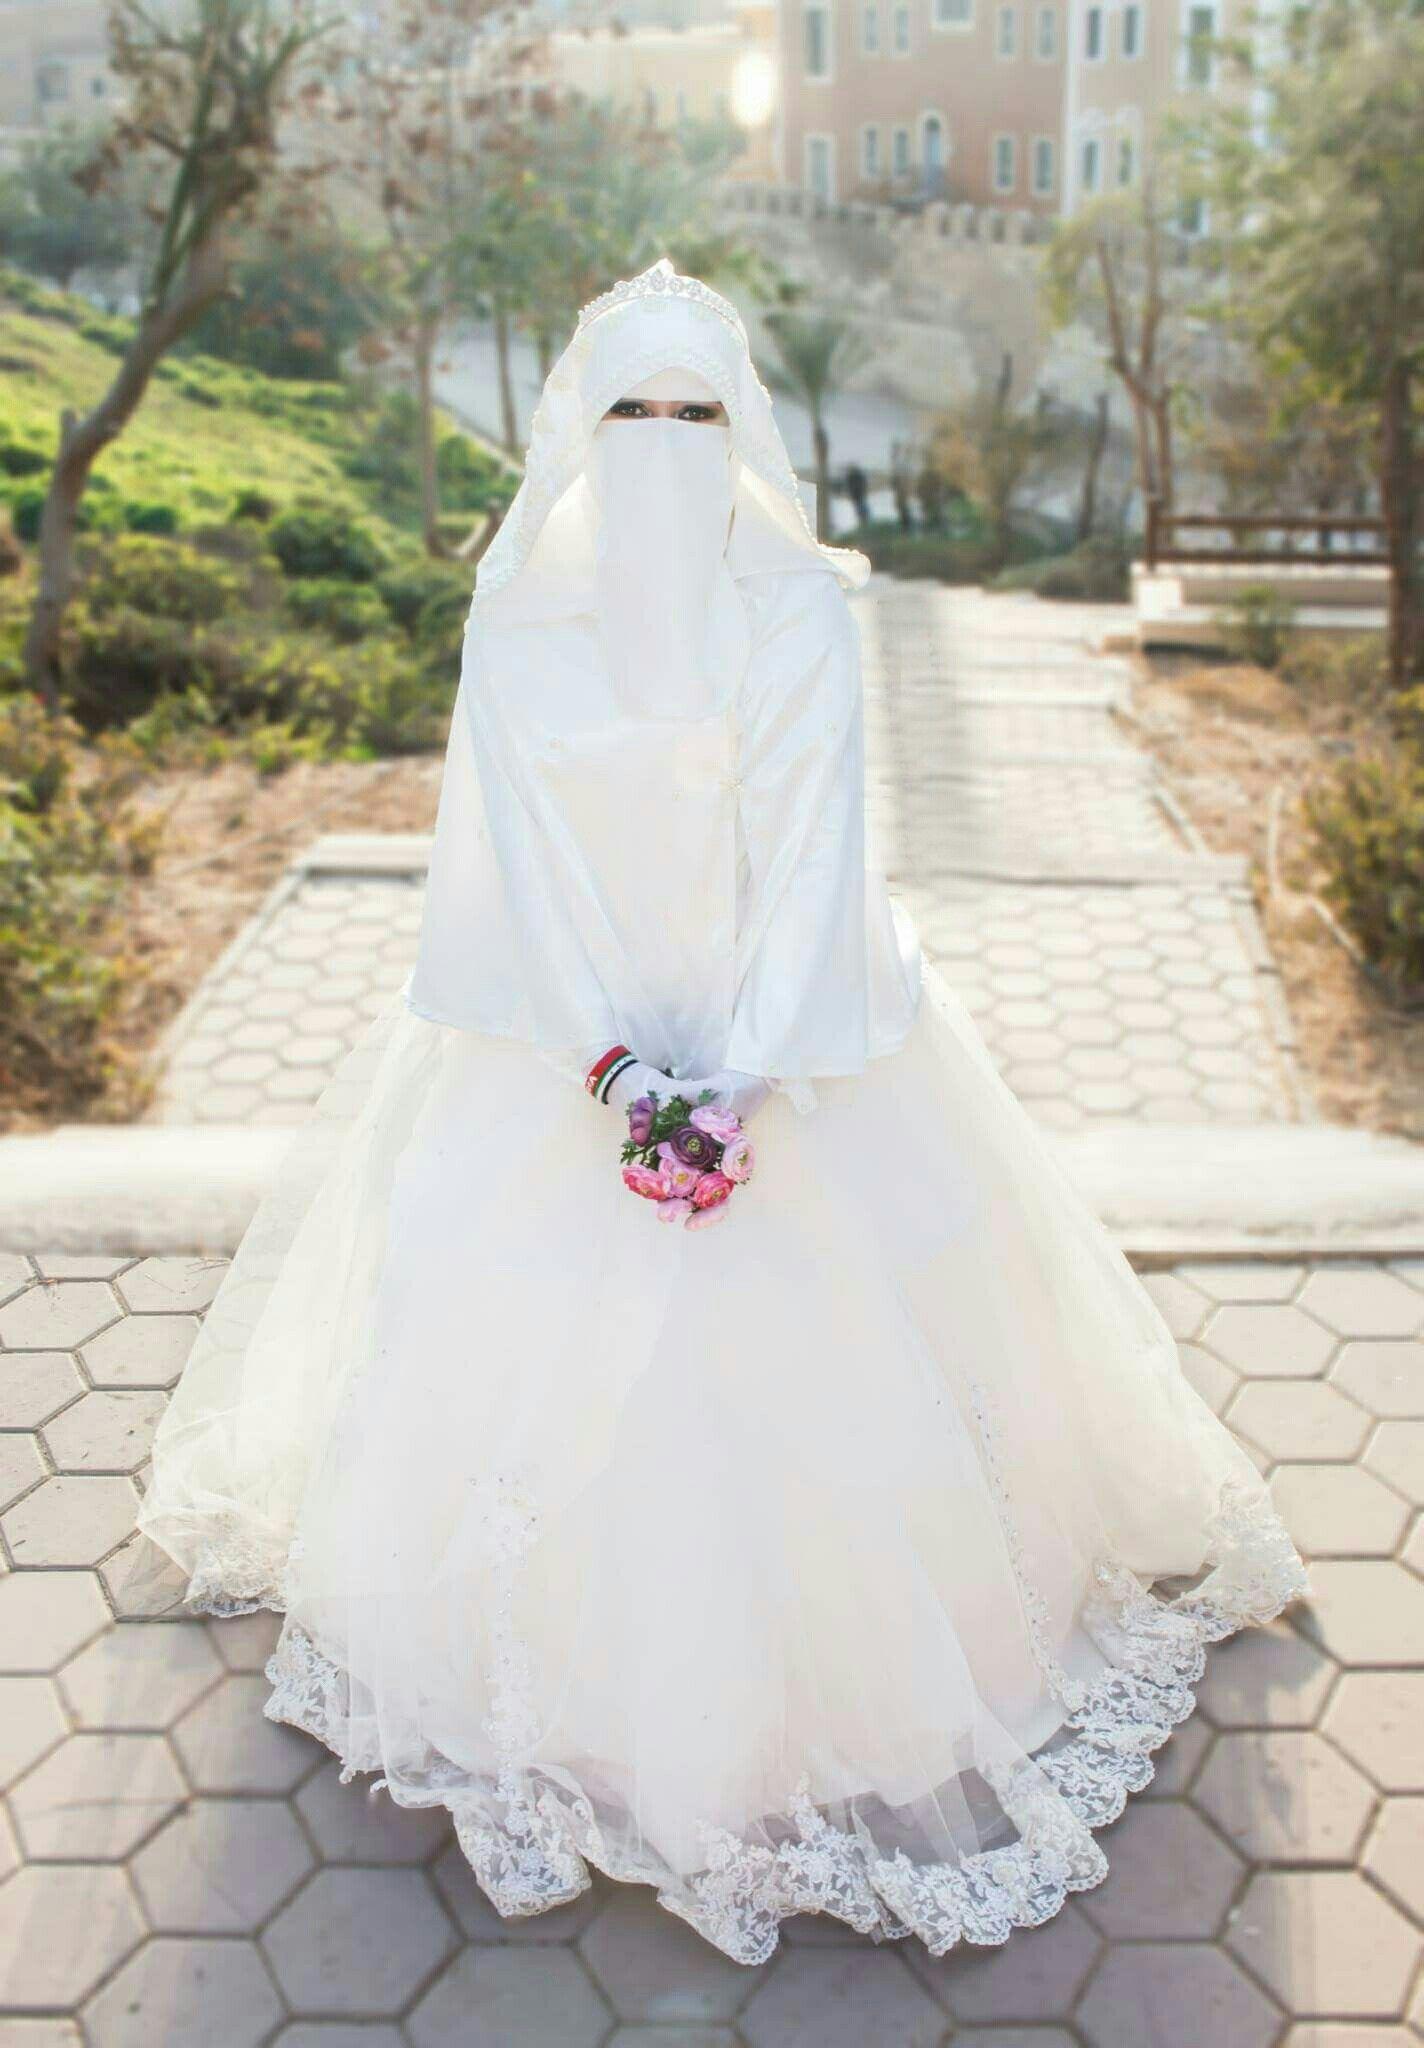 Pin by niqablover on Walimah Ideas  Hijab wedding dresses, Muslim